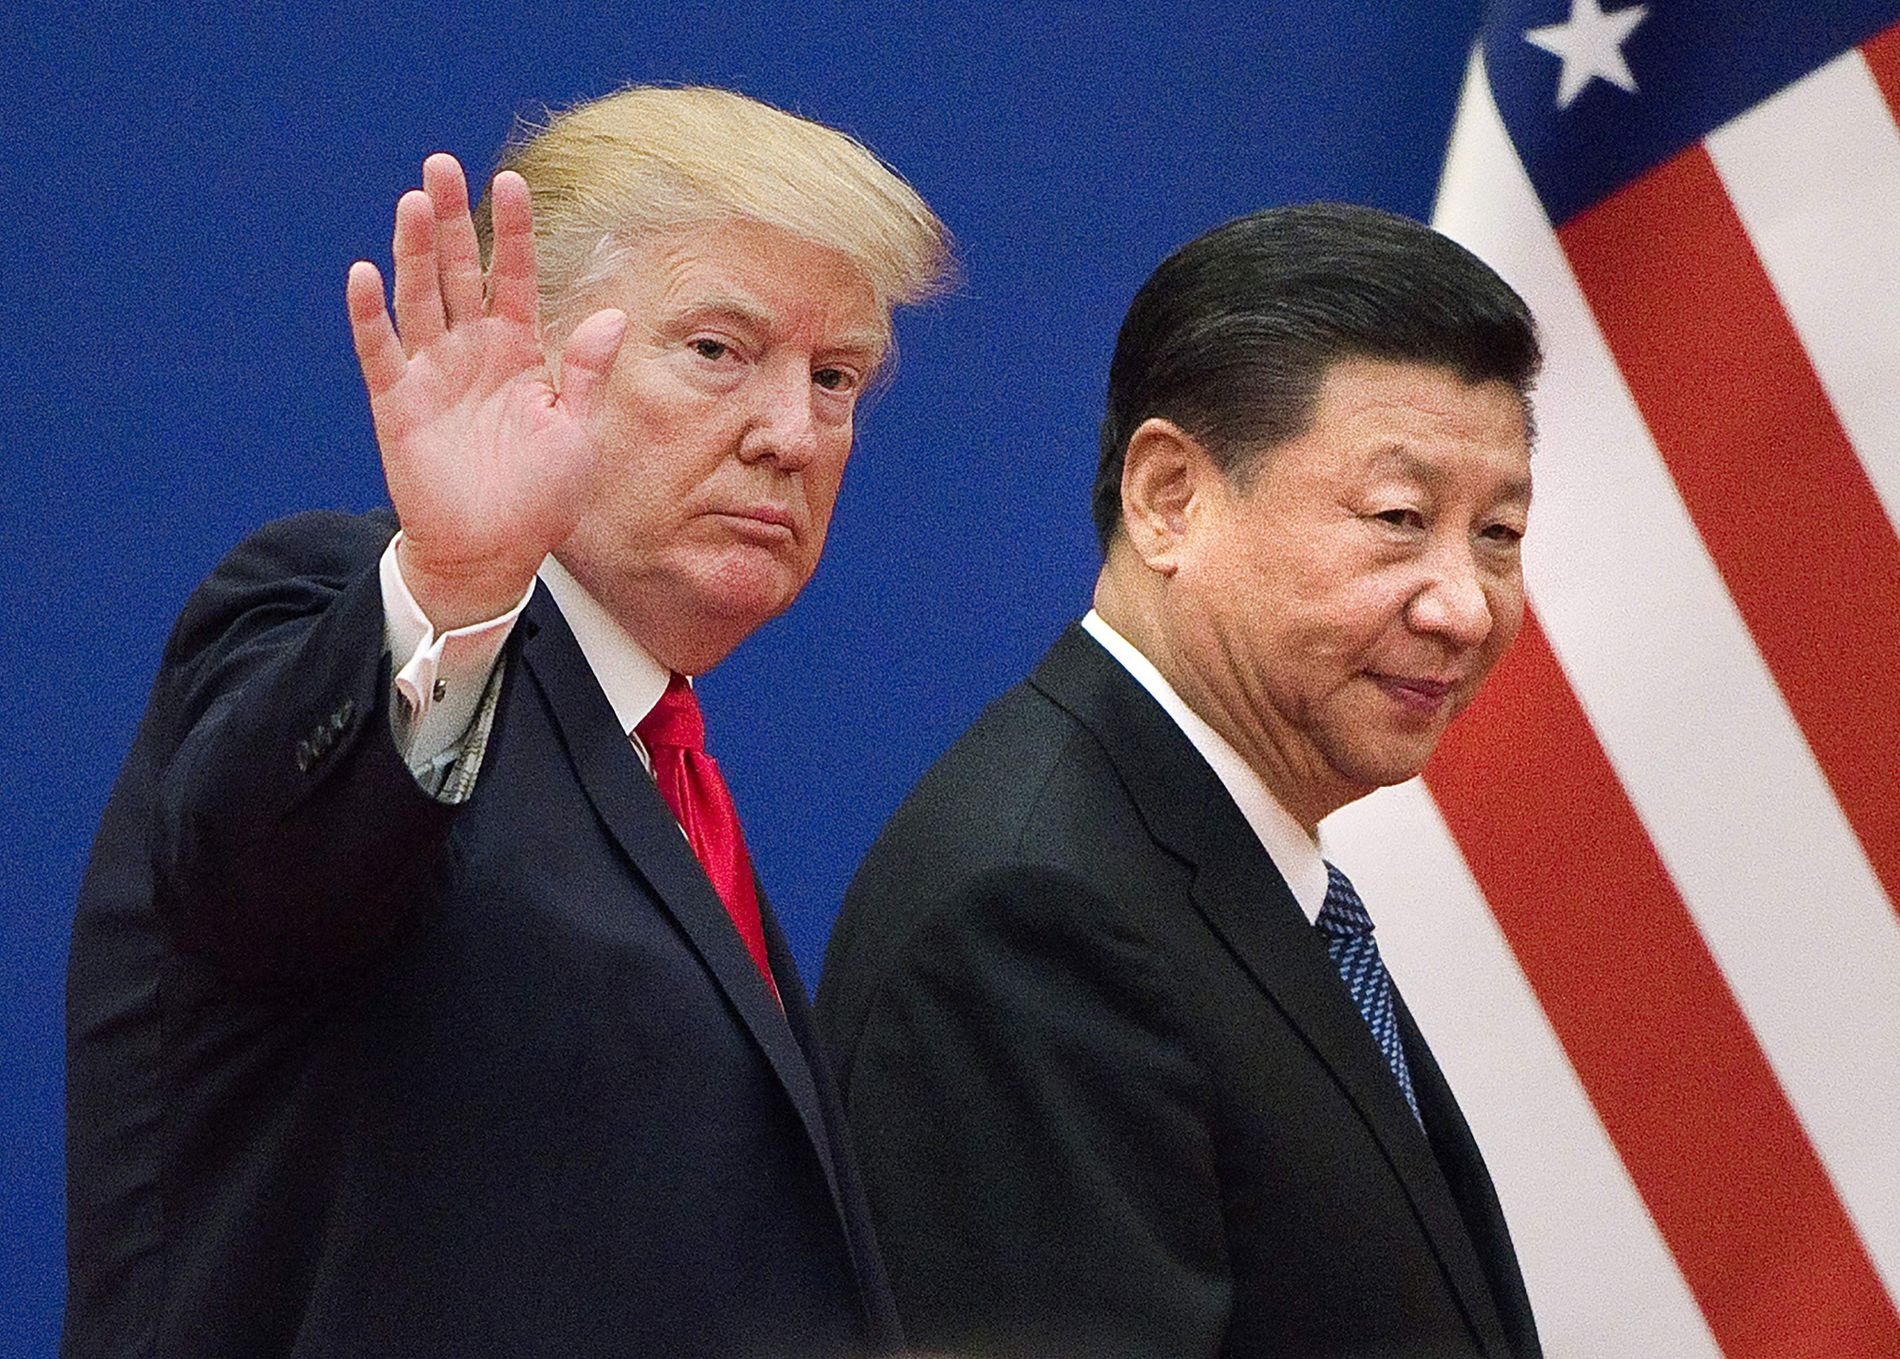 GODE BUSSER: Ifølge Kinas USA-ambassadør Cui Tiankai er Donald Trump og Kina-president Xi gode busser.